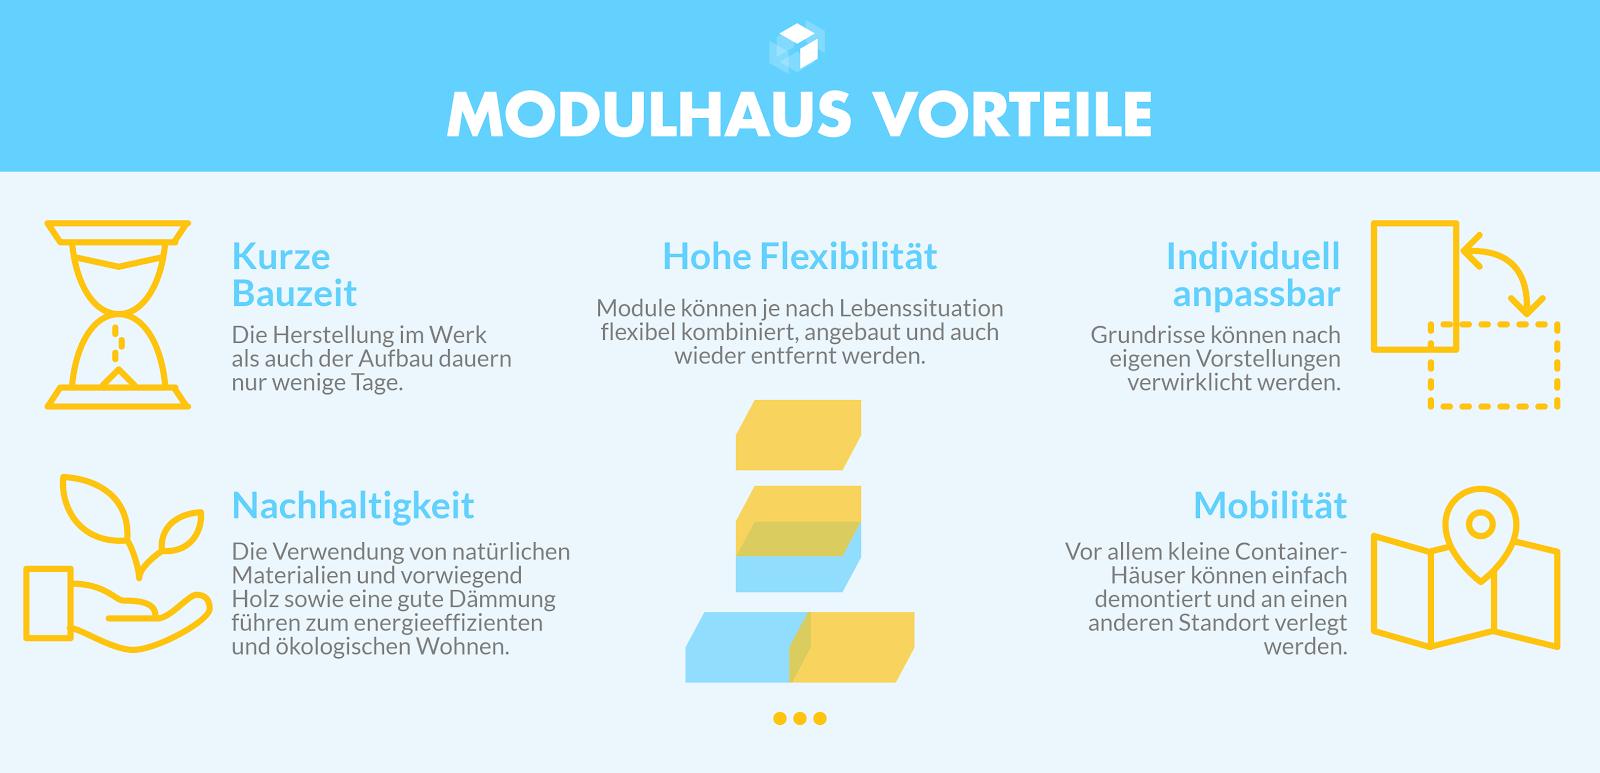 Modulh user und container h user anbieter infos preise for Fertighaus container modul